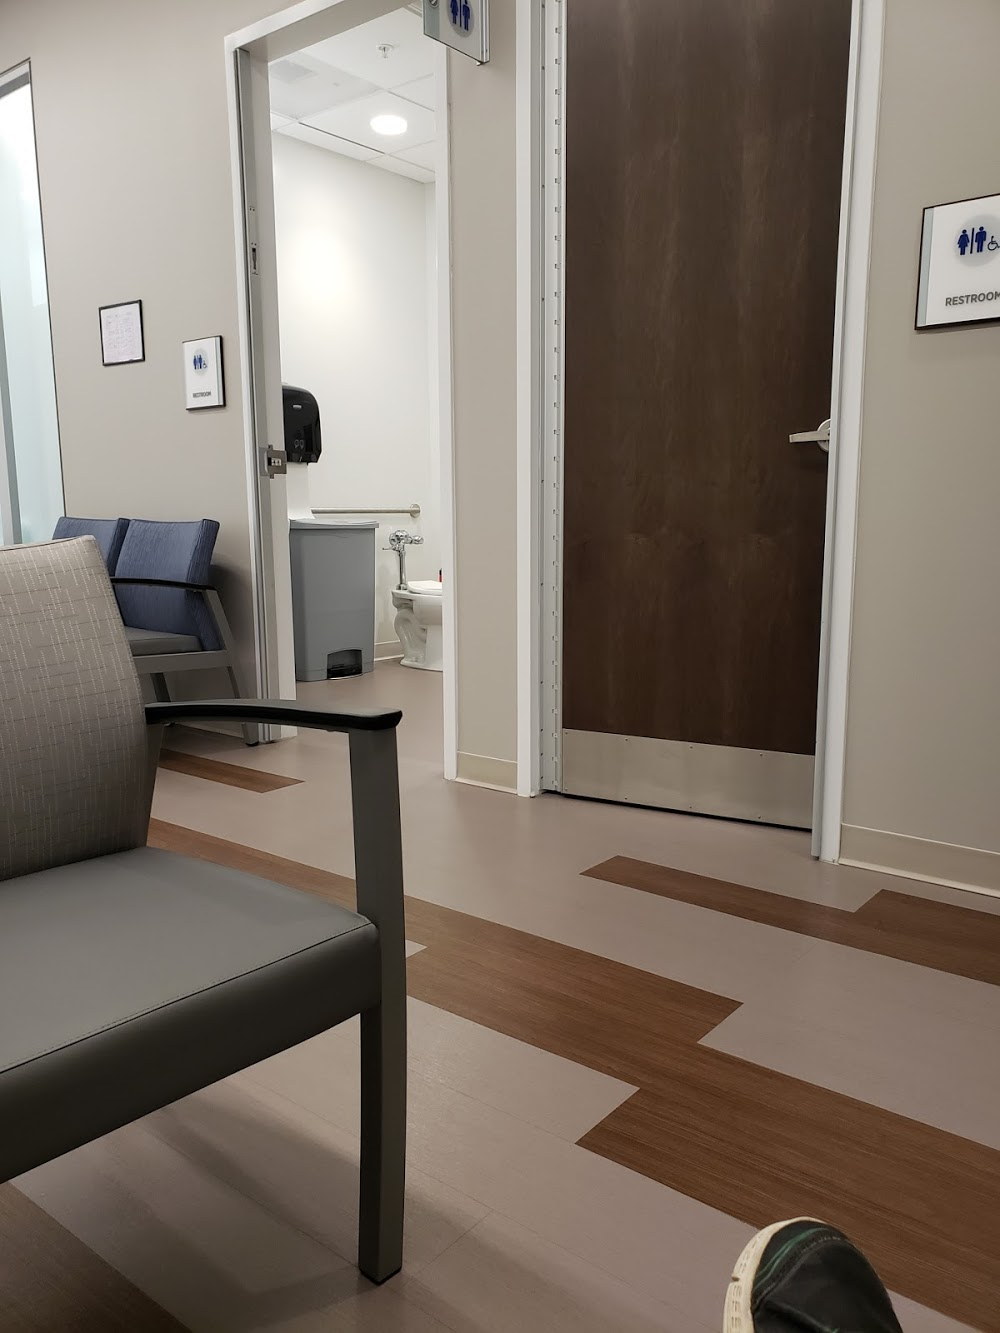 Woodward Medical Center